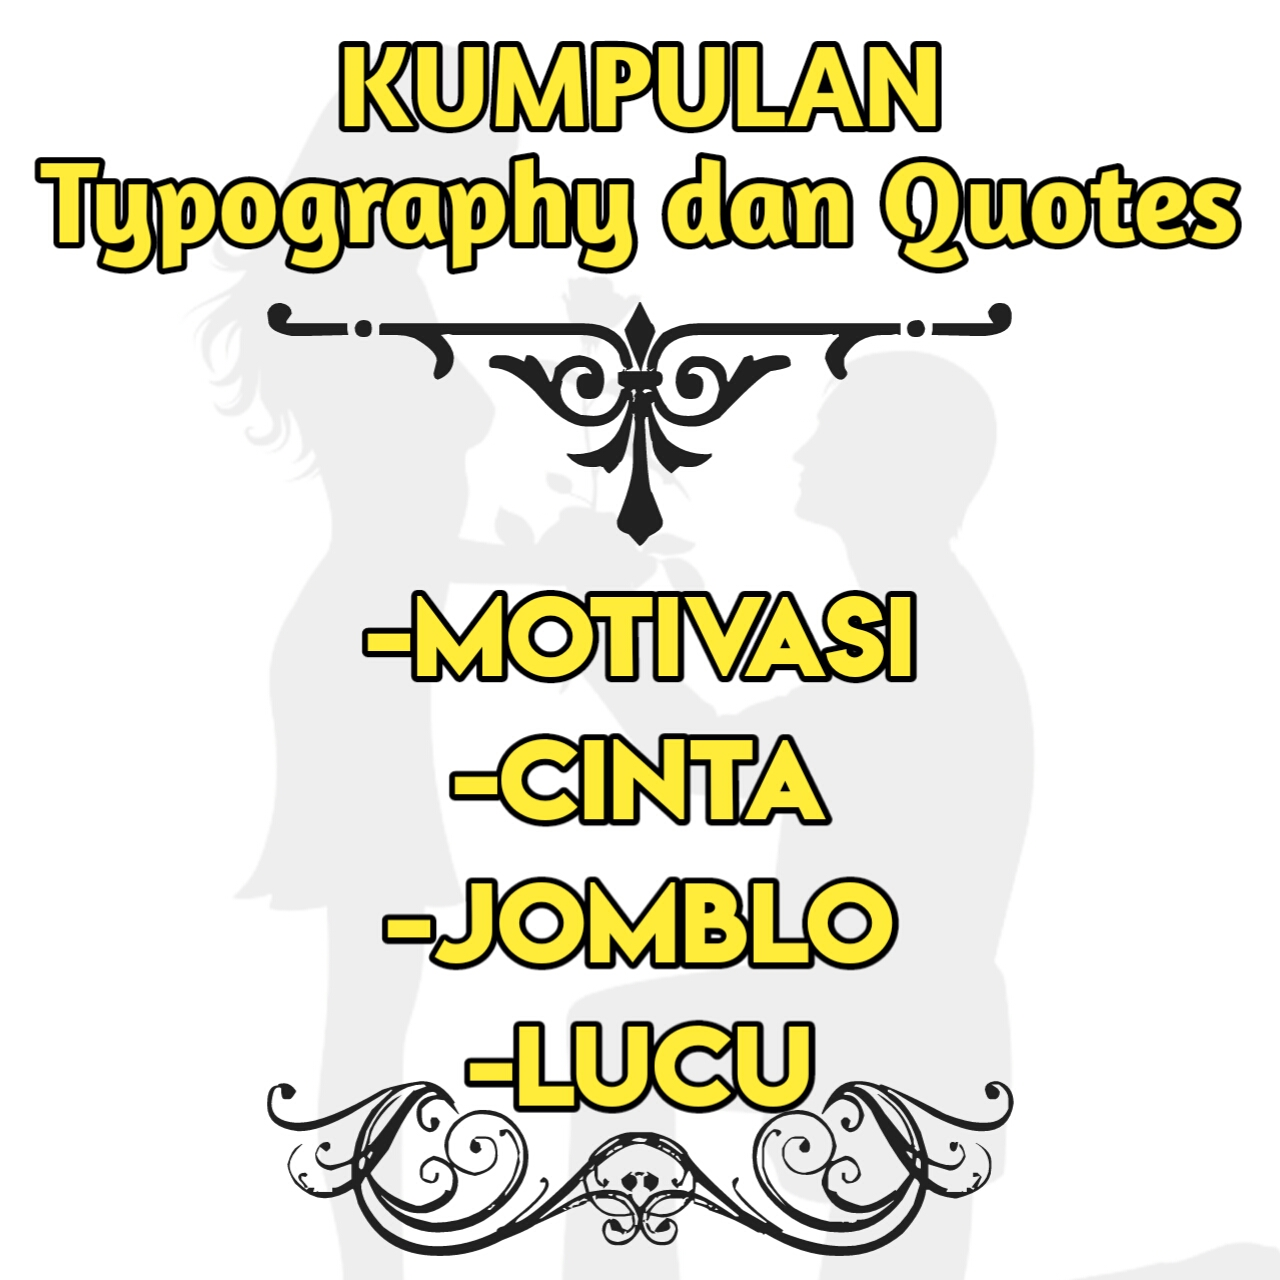 Kumpulan Kata Kata Keren Typography Dan Quotes Tentang Cinta